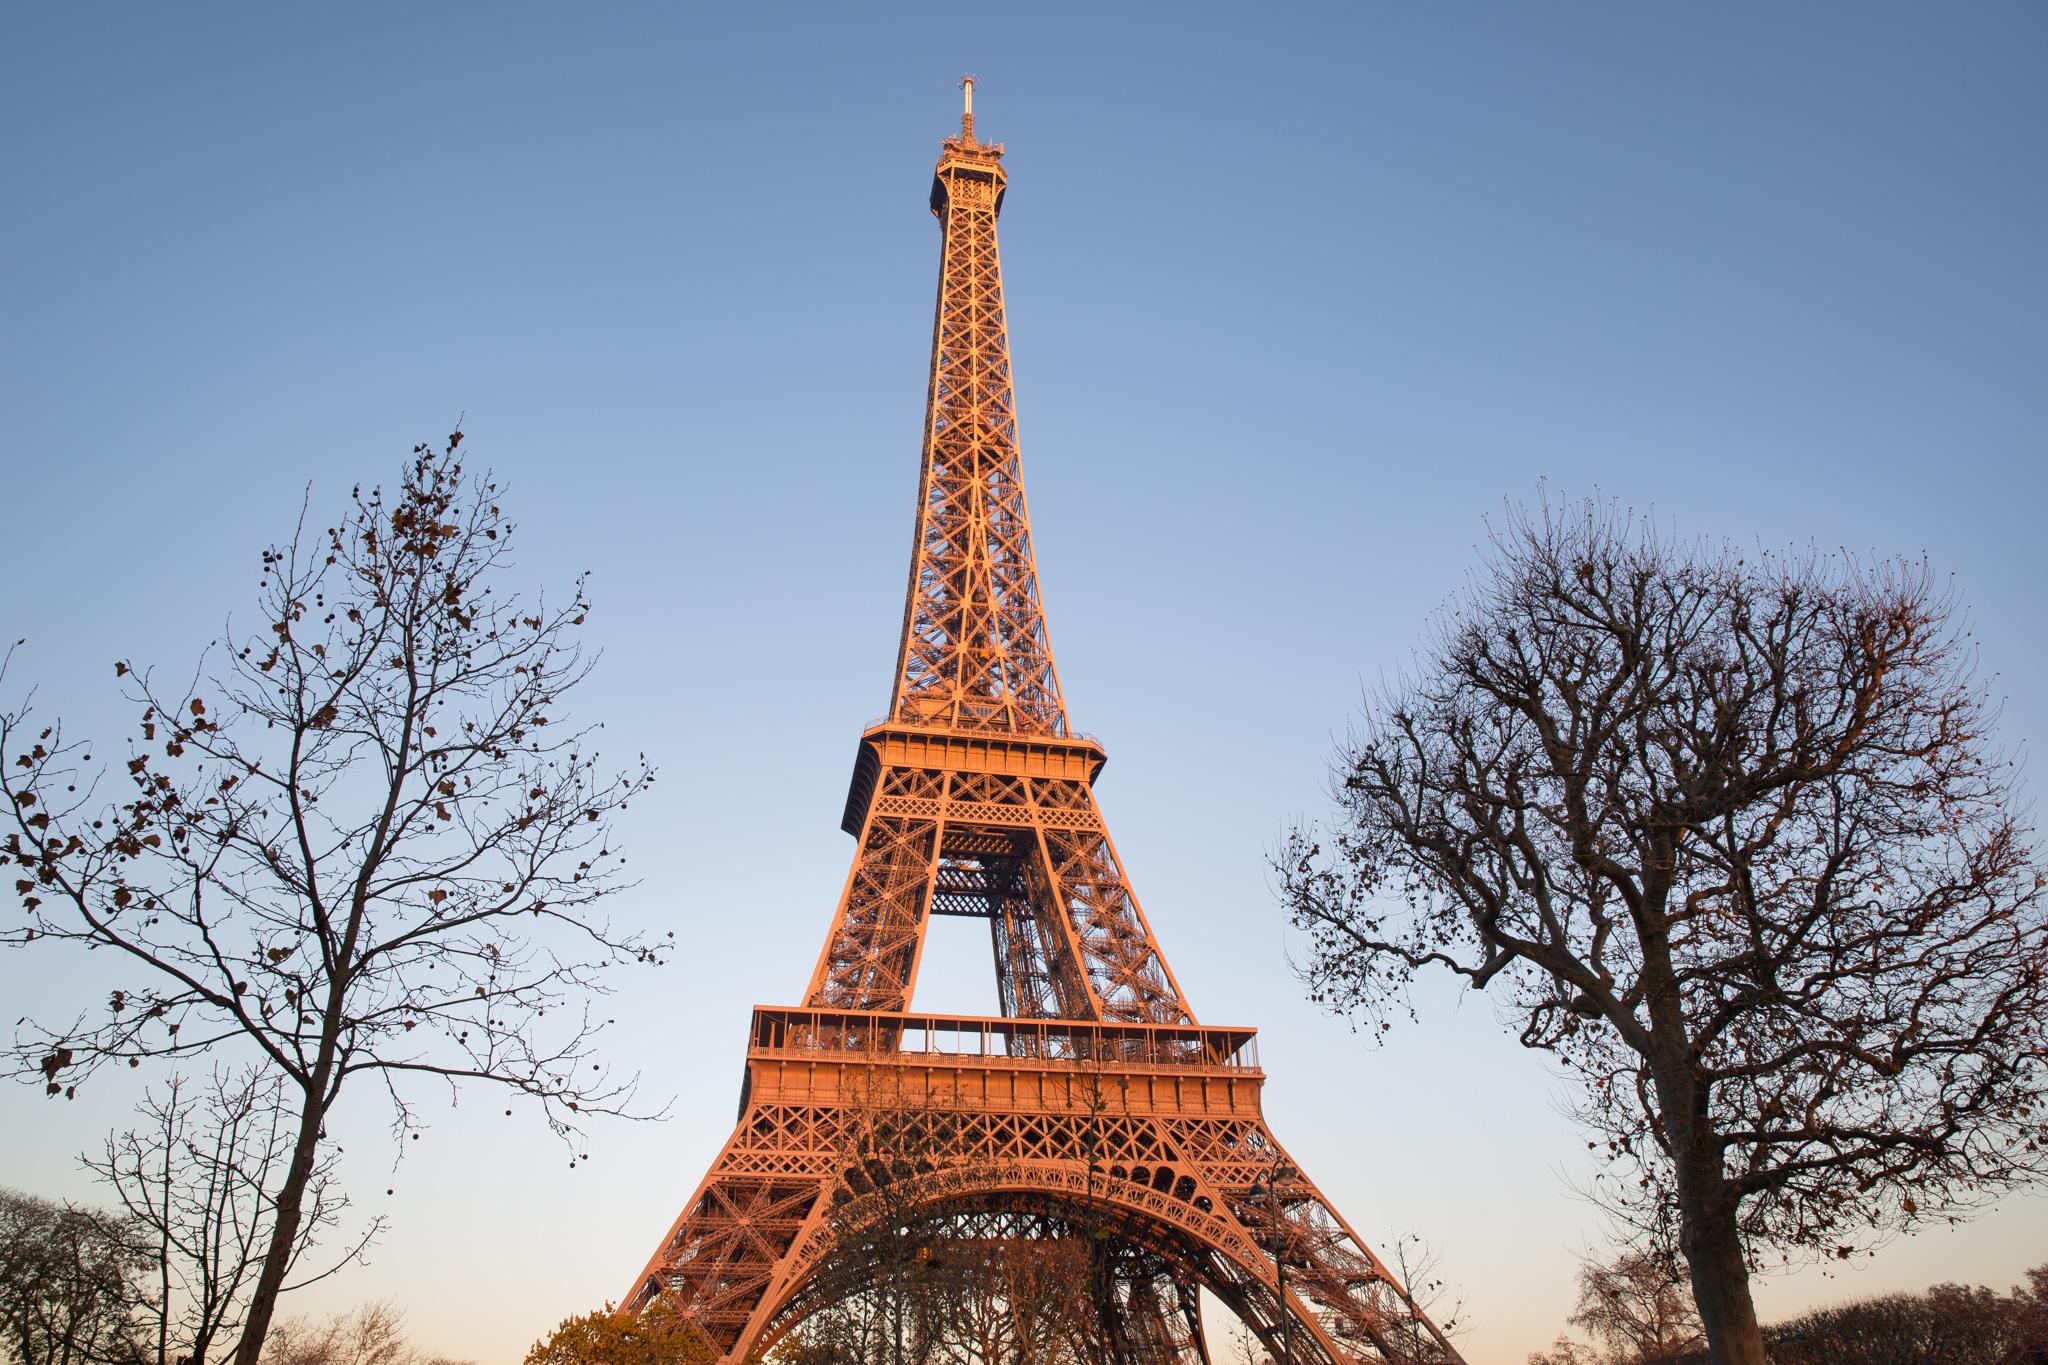 9553-famous-urban-photograph-in-paris.jpg